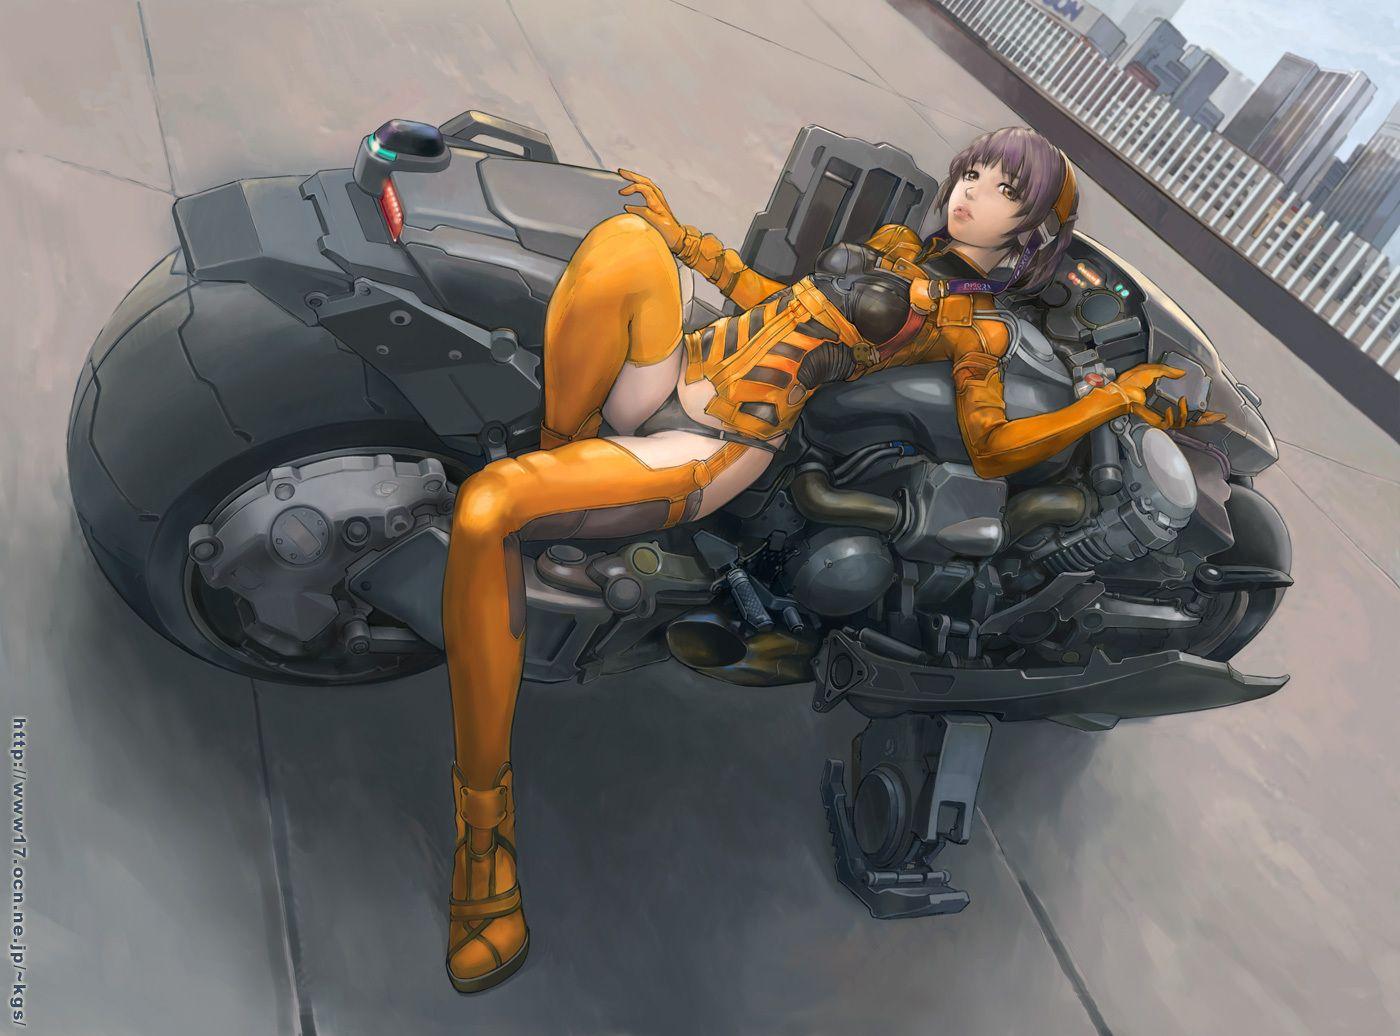 Future girl futuristic vehicle anime sexy comic girl cyberpunk motorbike digital art sci fi futuristic suit science fiction future japan